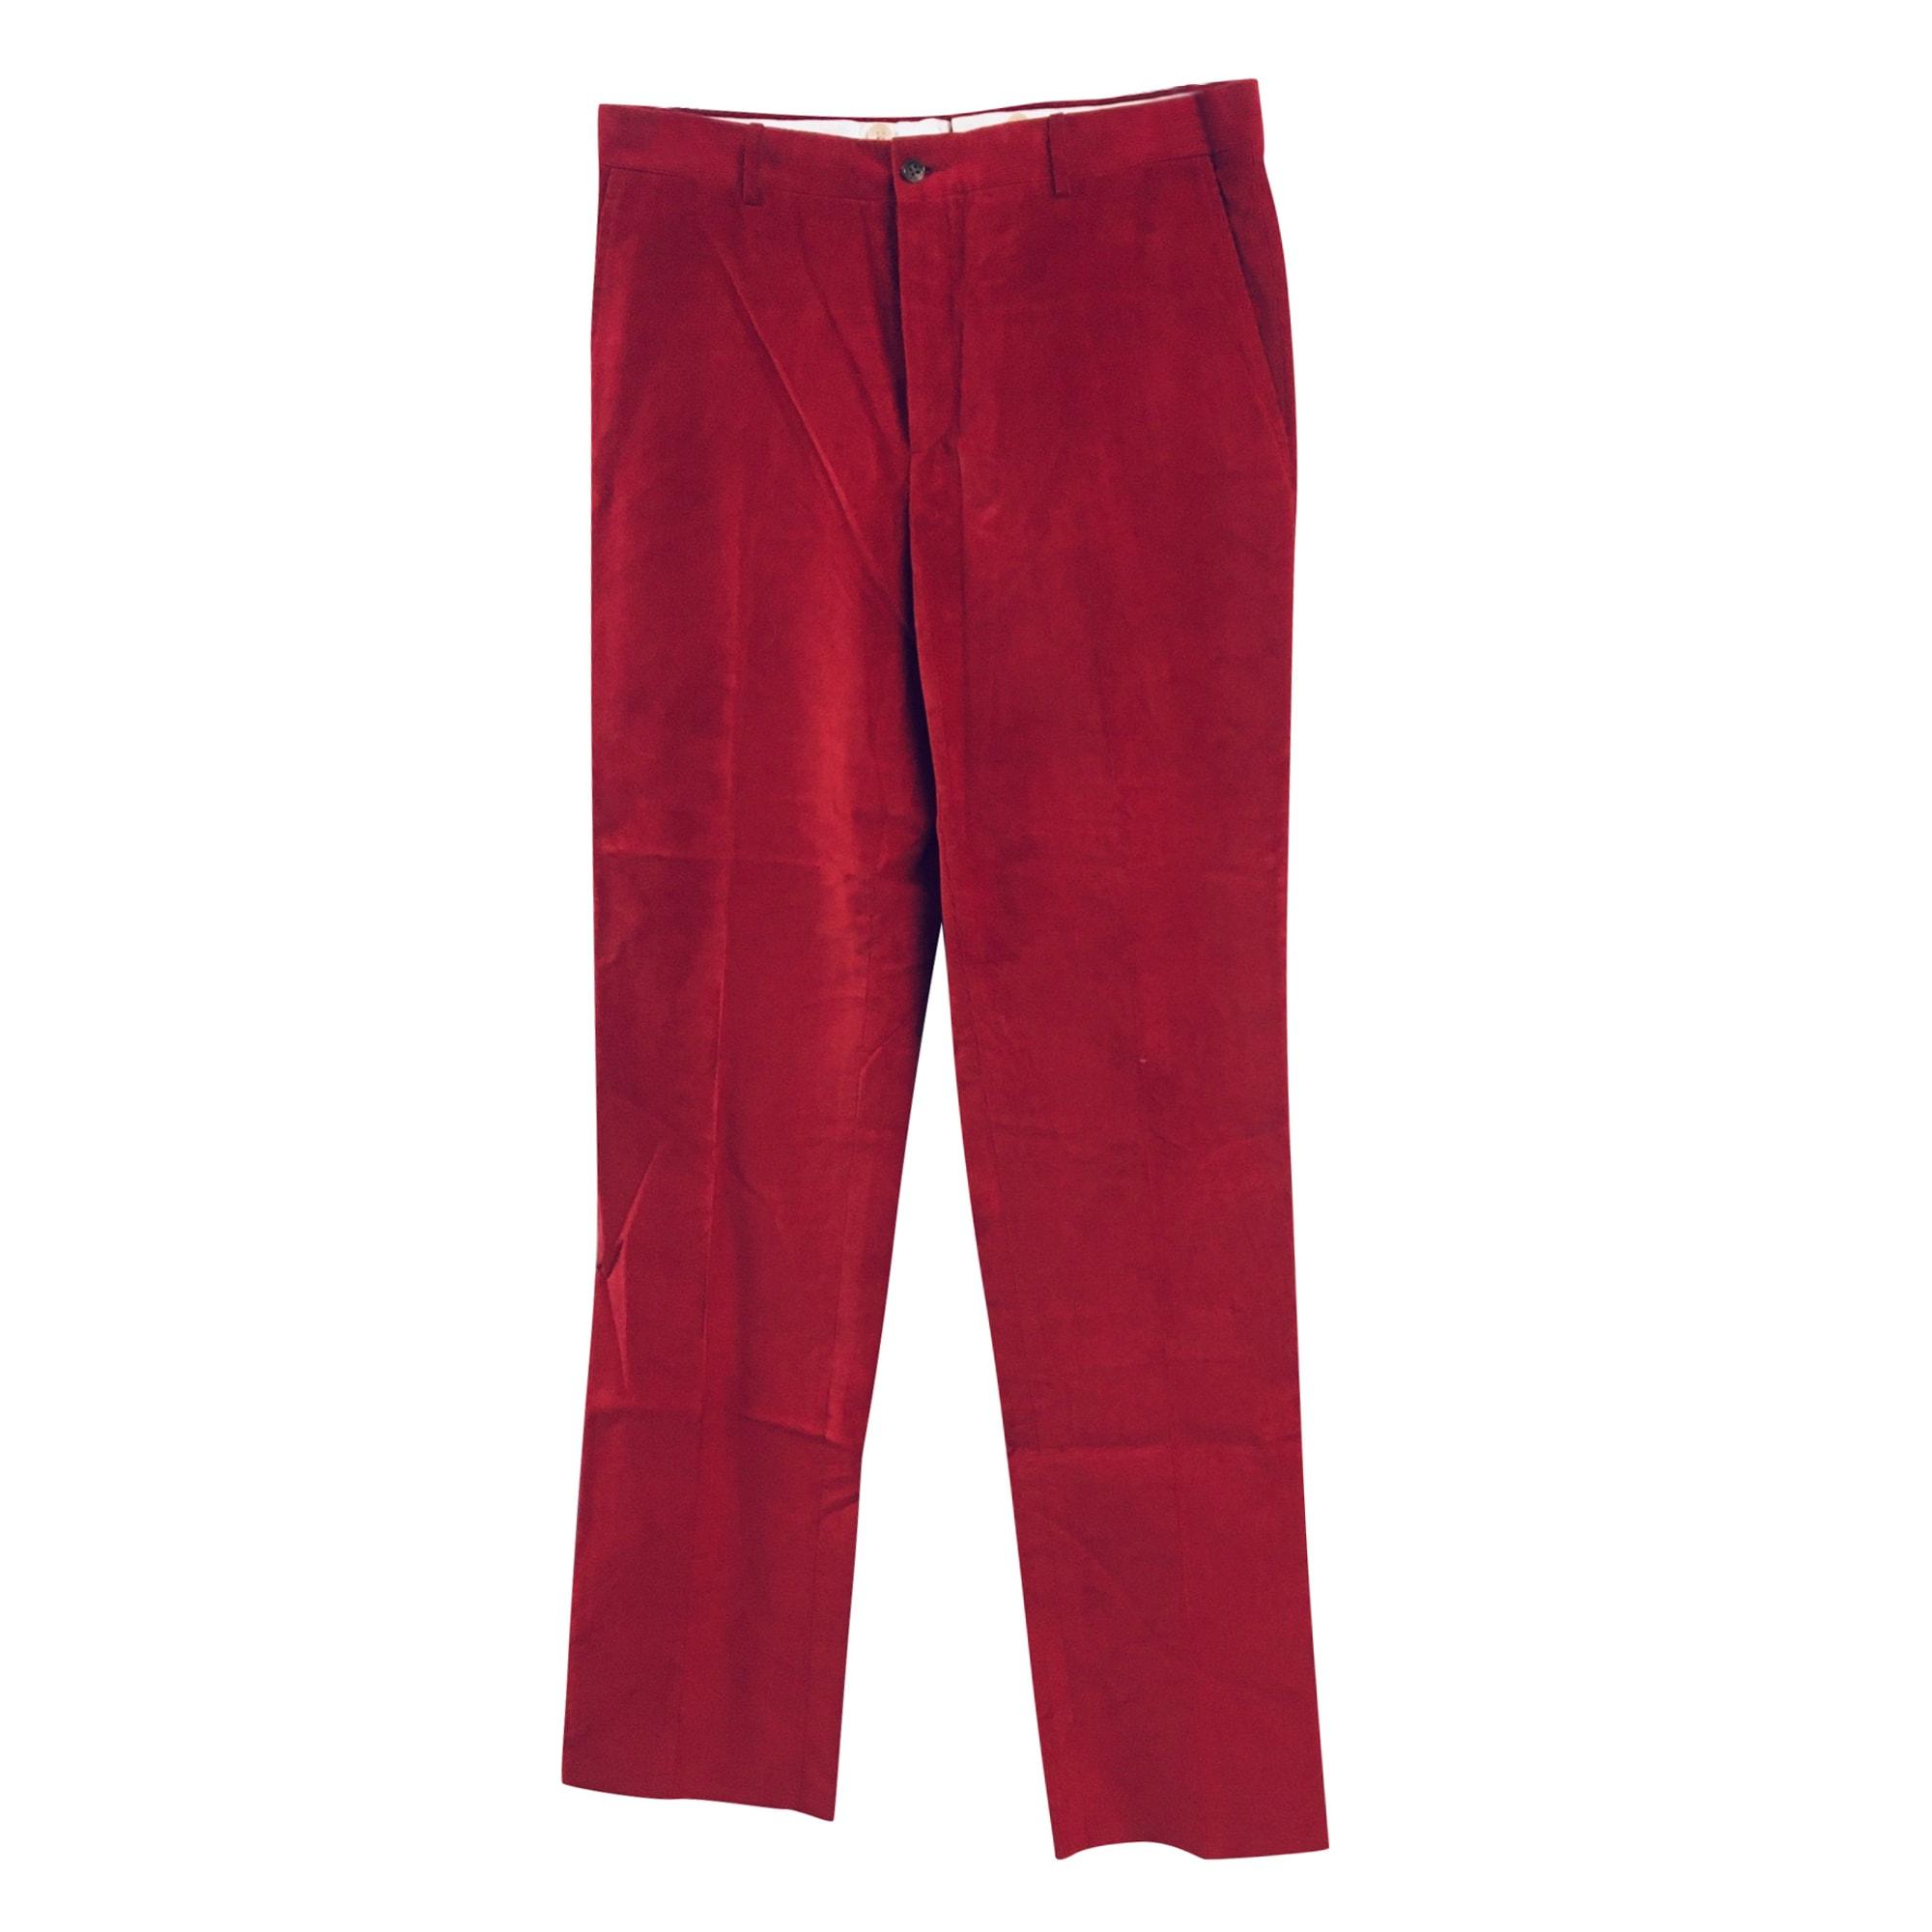 Straight Leg Pants RALPH LAUREN Red, burgundy